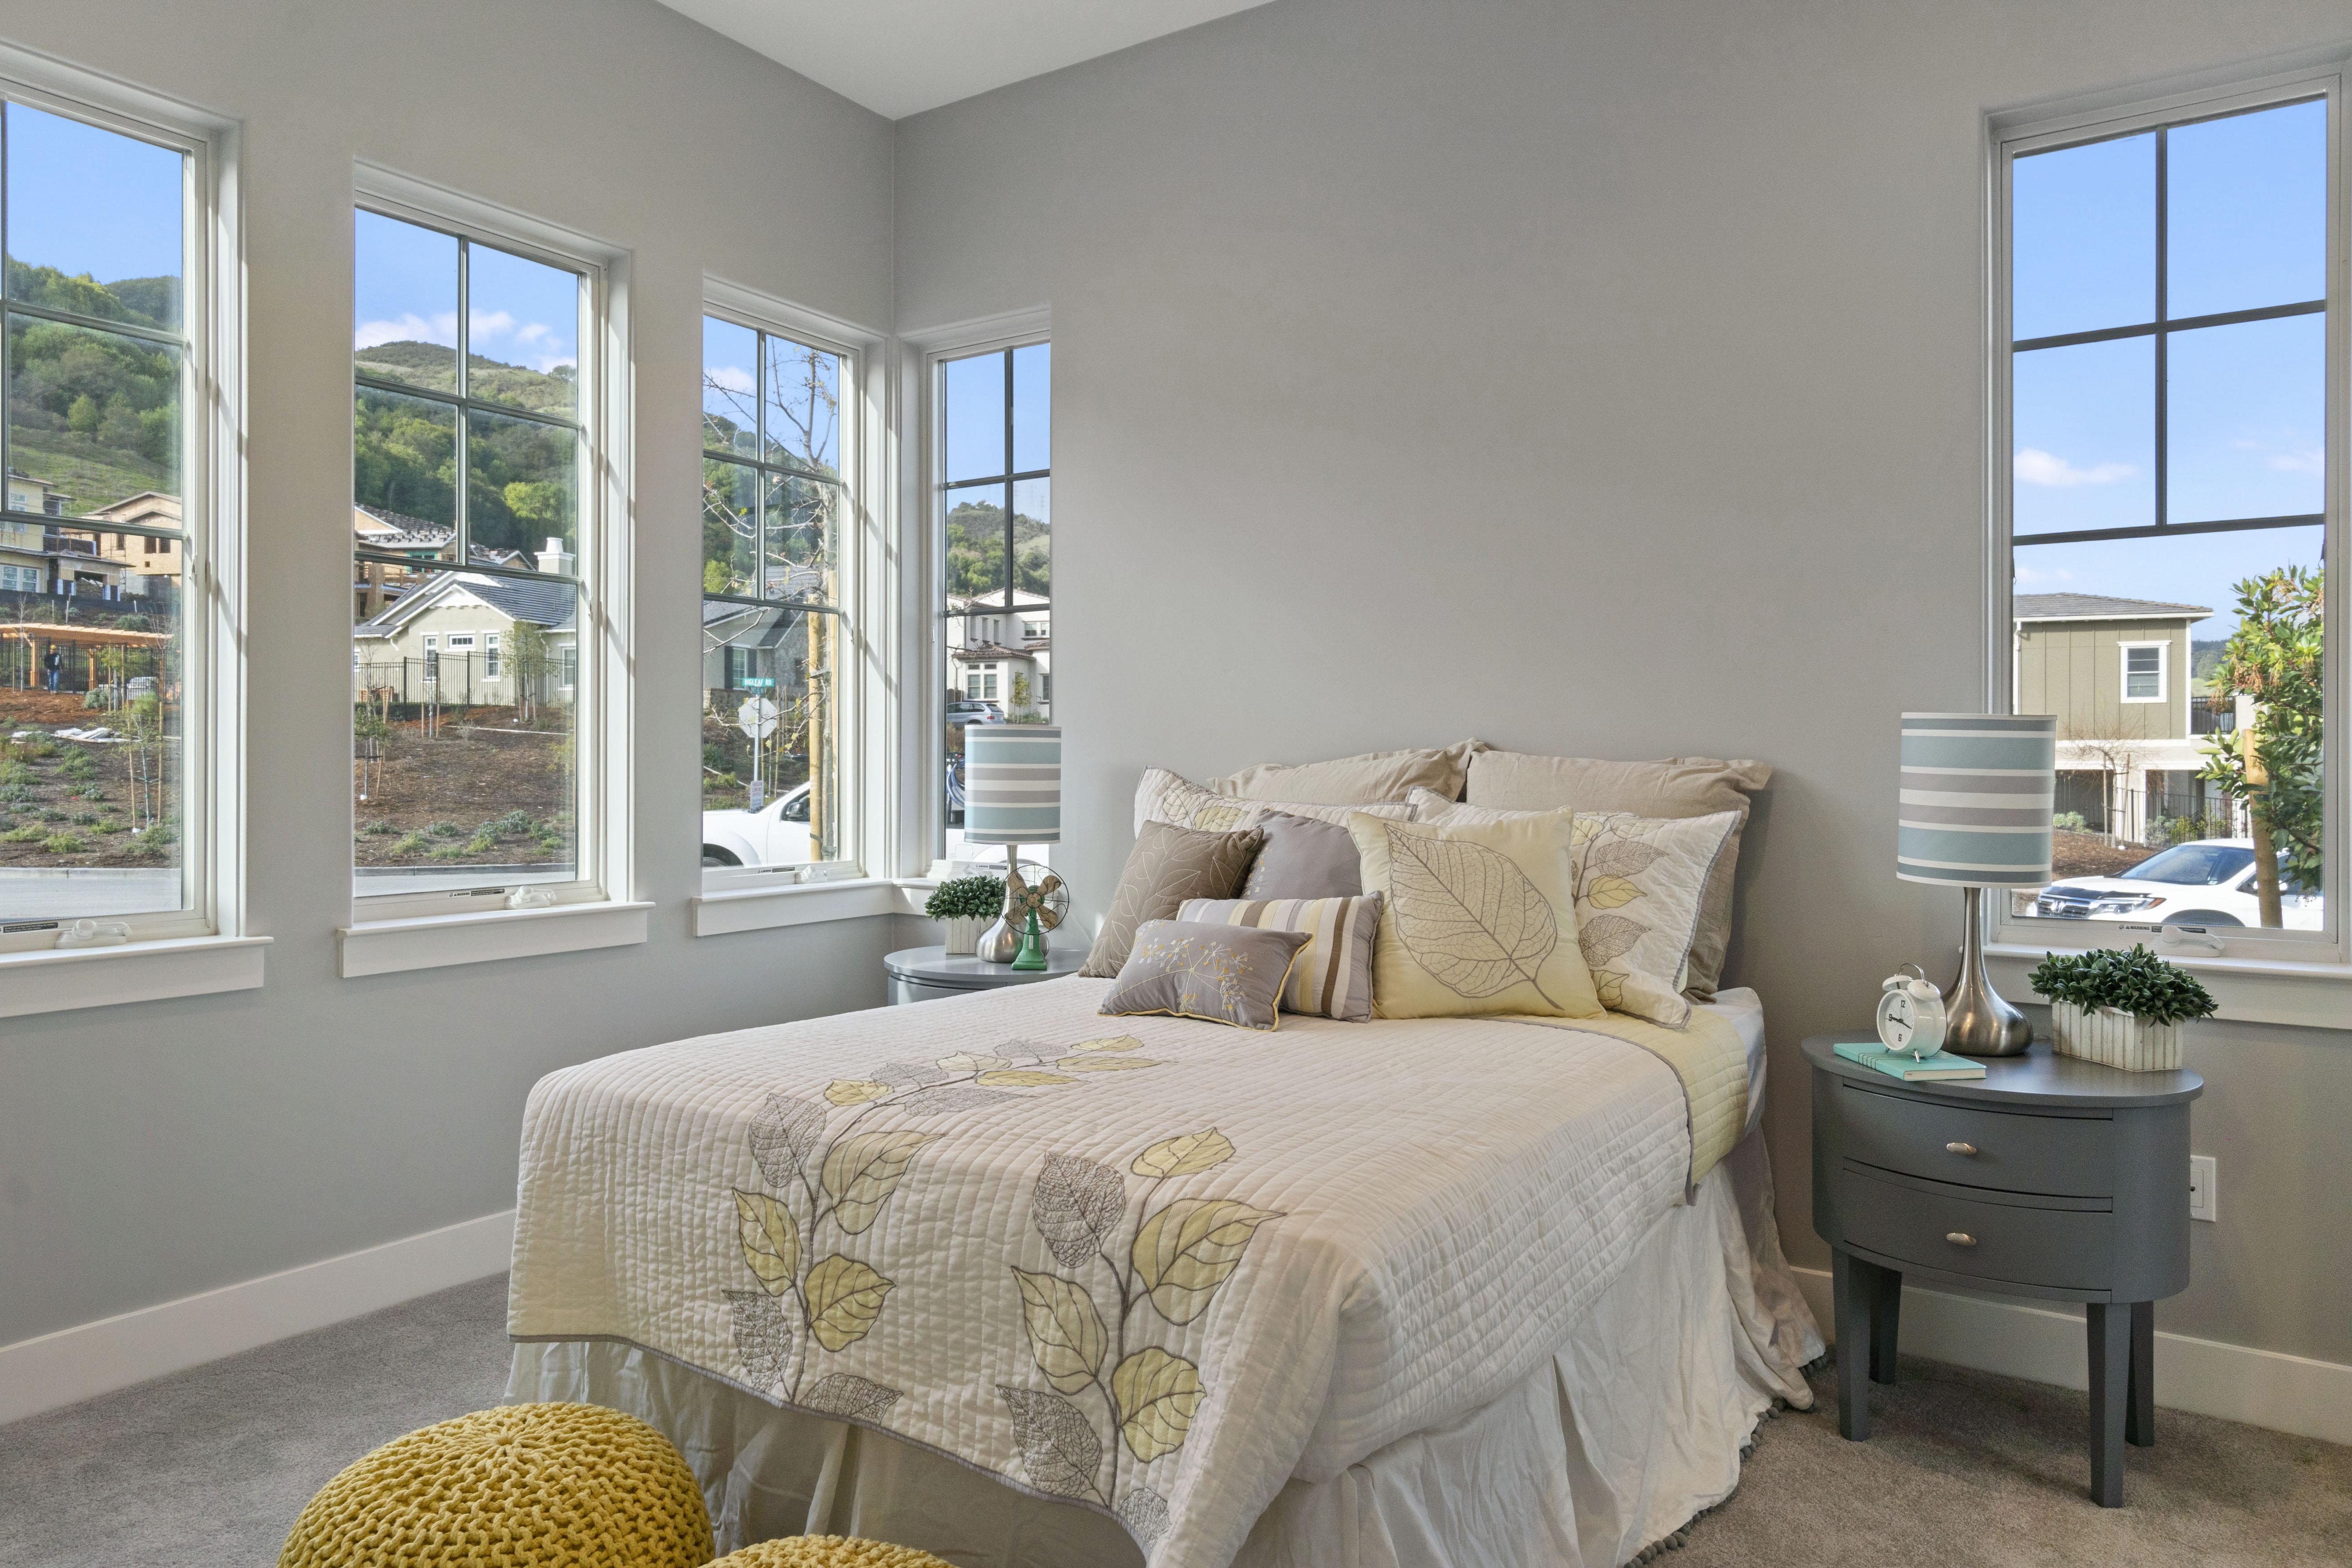 Bedroom flooring   Elite Builder Services